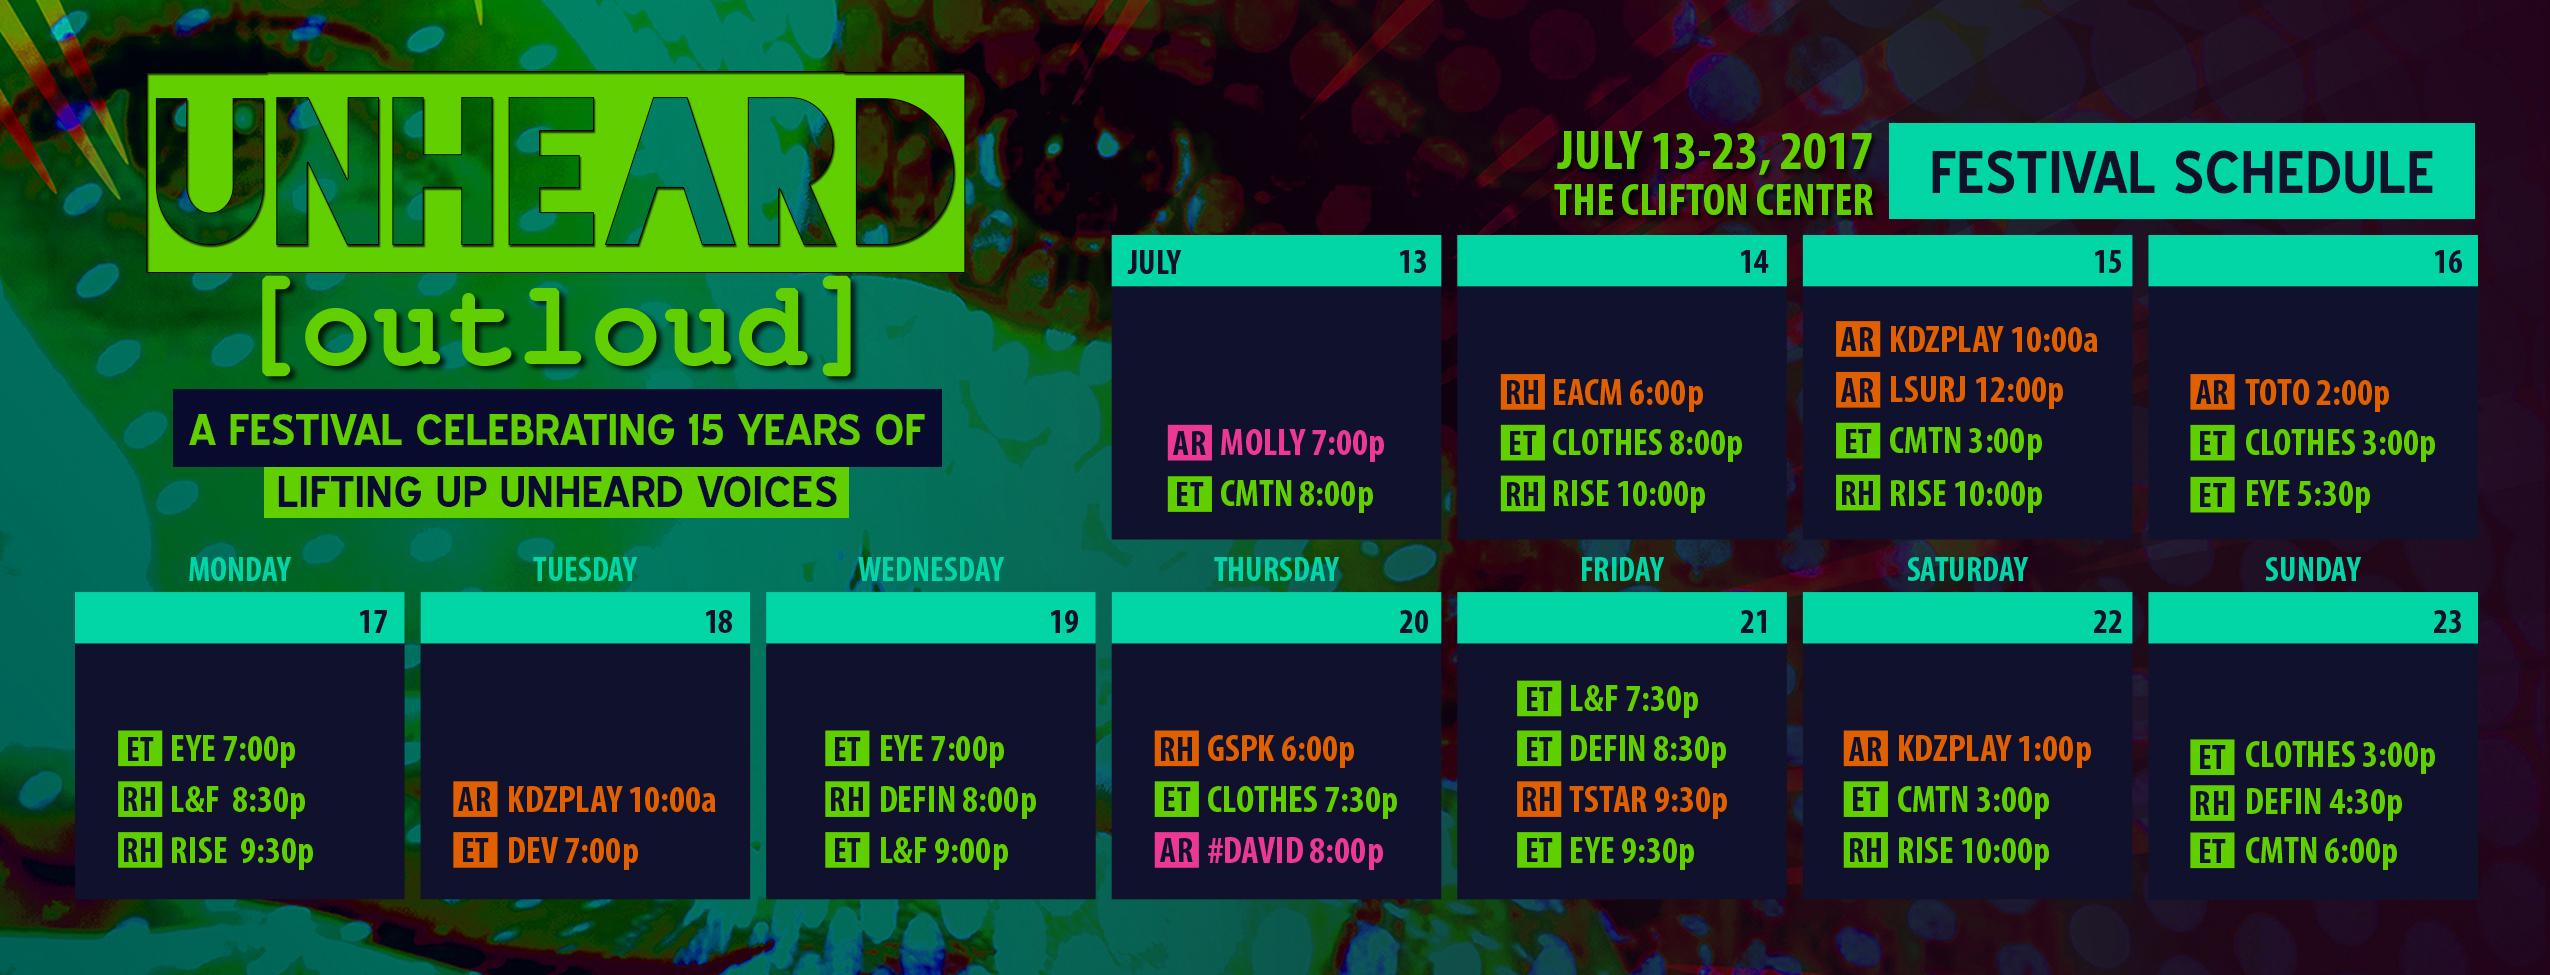 UNHEARD [outloud] Schedule